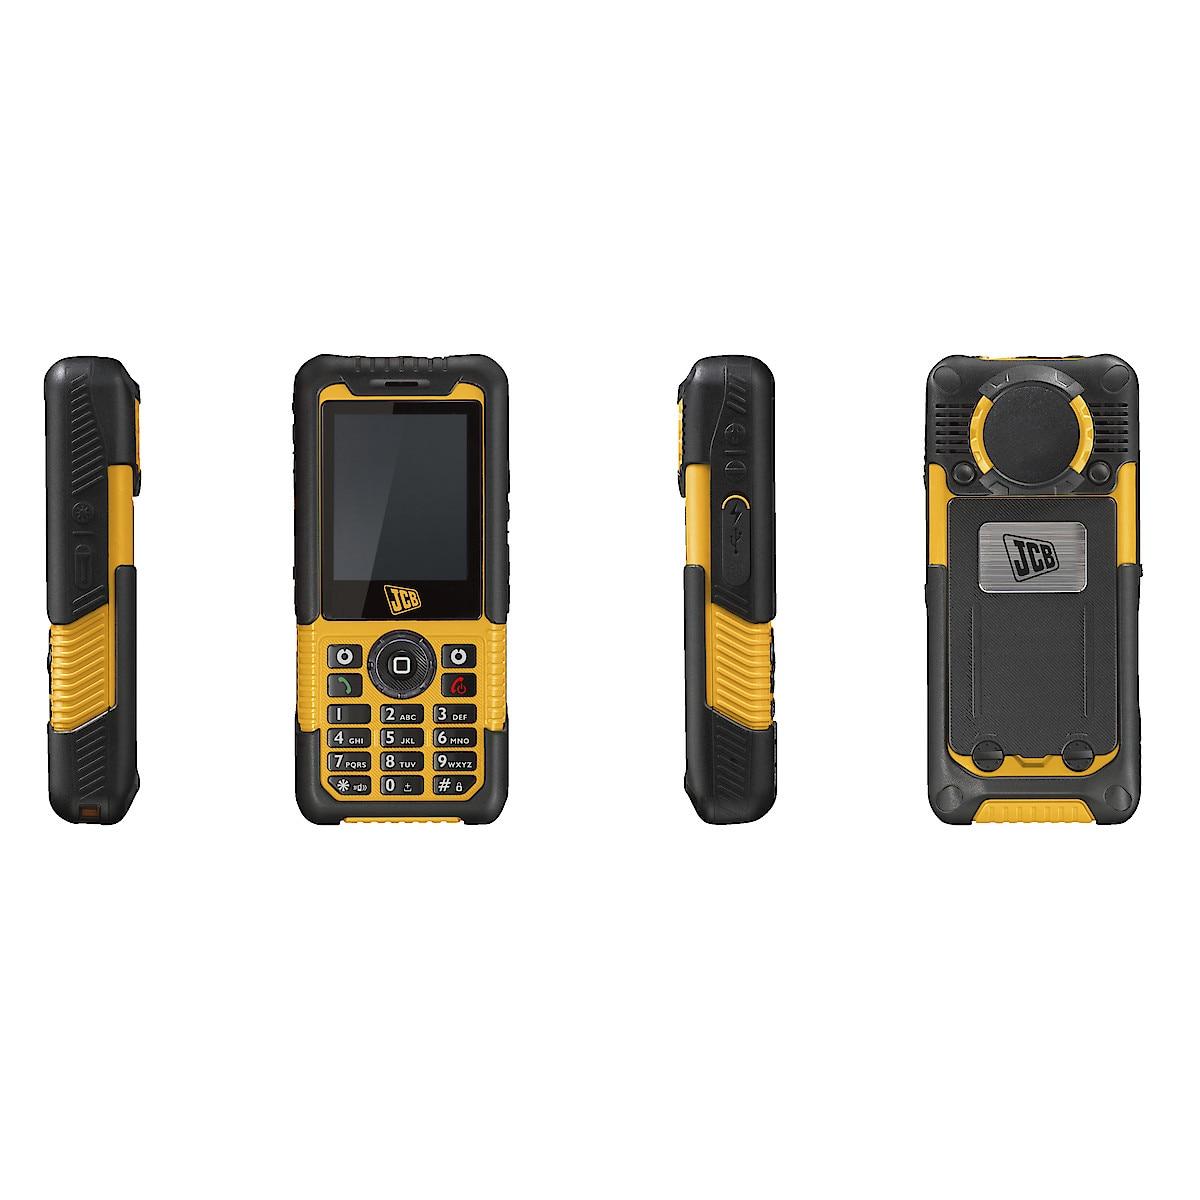 JCB Toughphone Sitemaste mobiltelefon